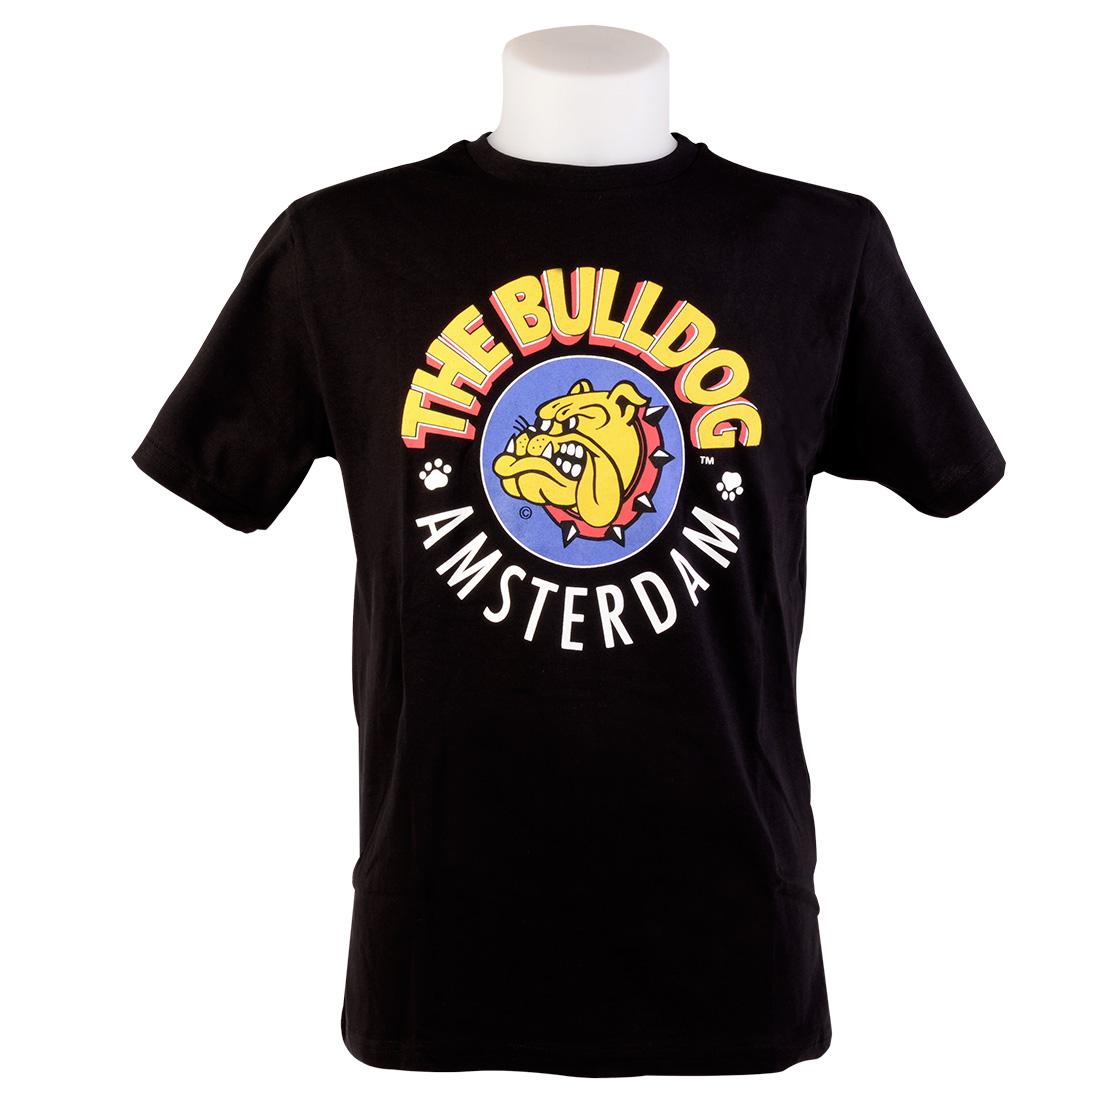 t shirt the bulldog